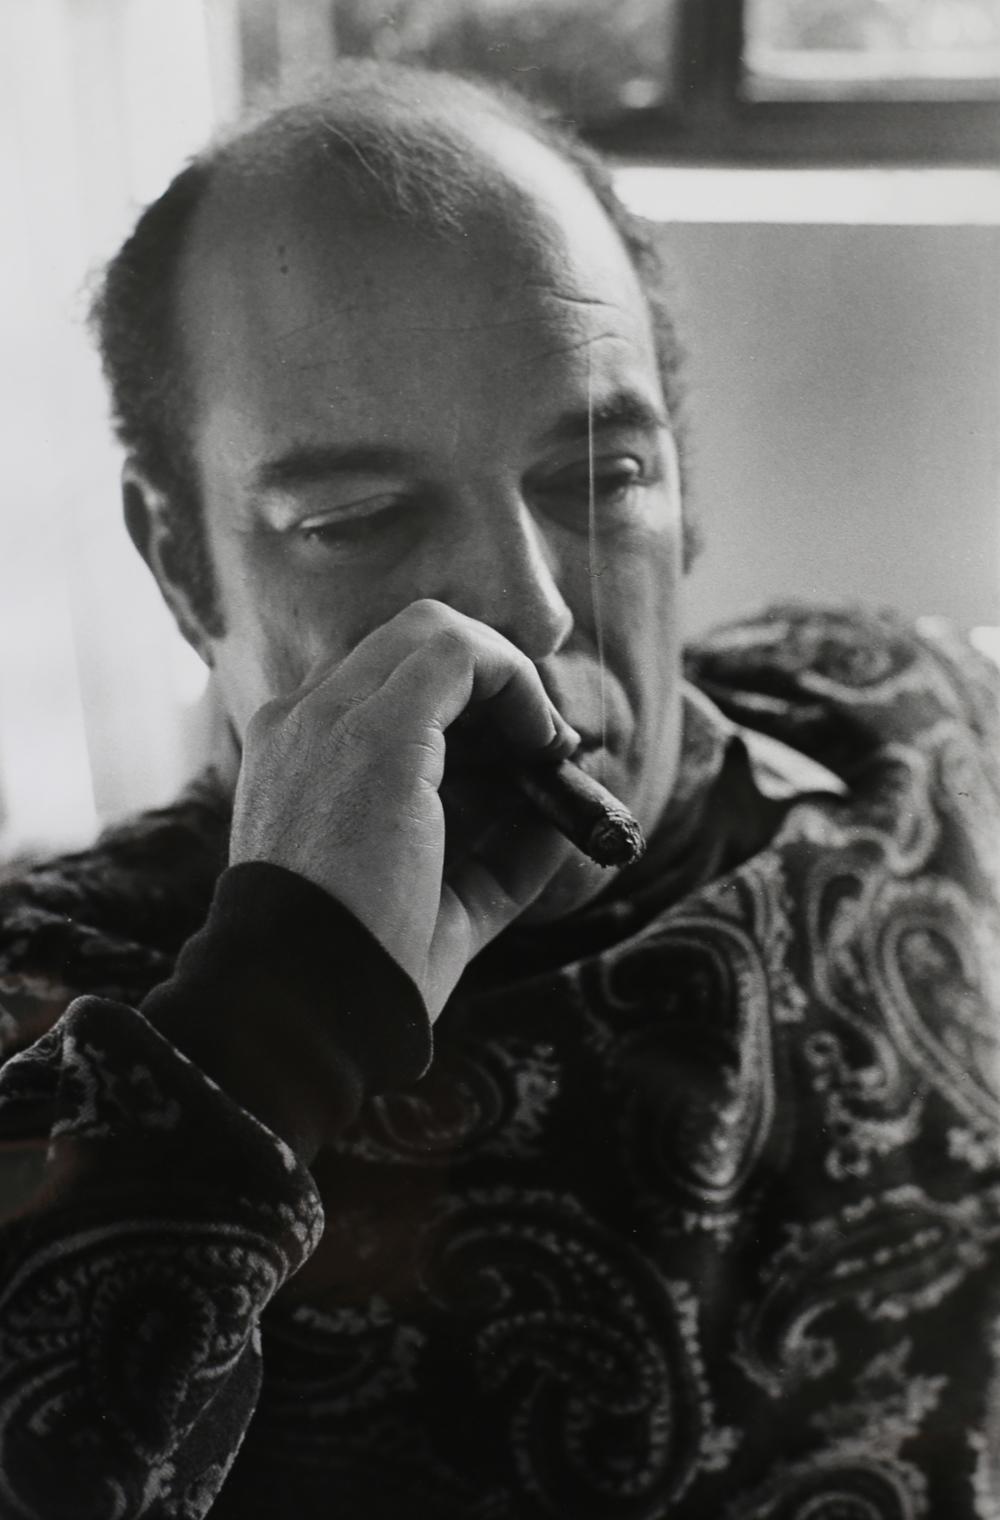 Jaime Gil de Biedma, poeta. Barcellona, 1971.